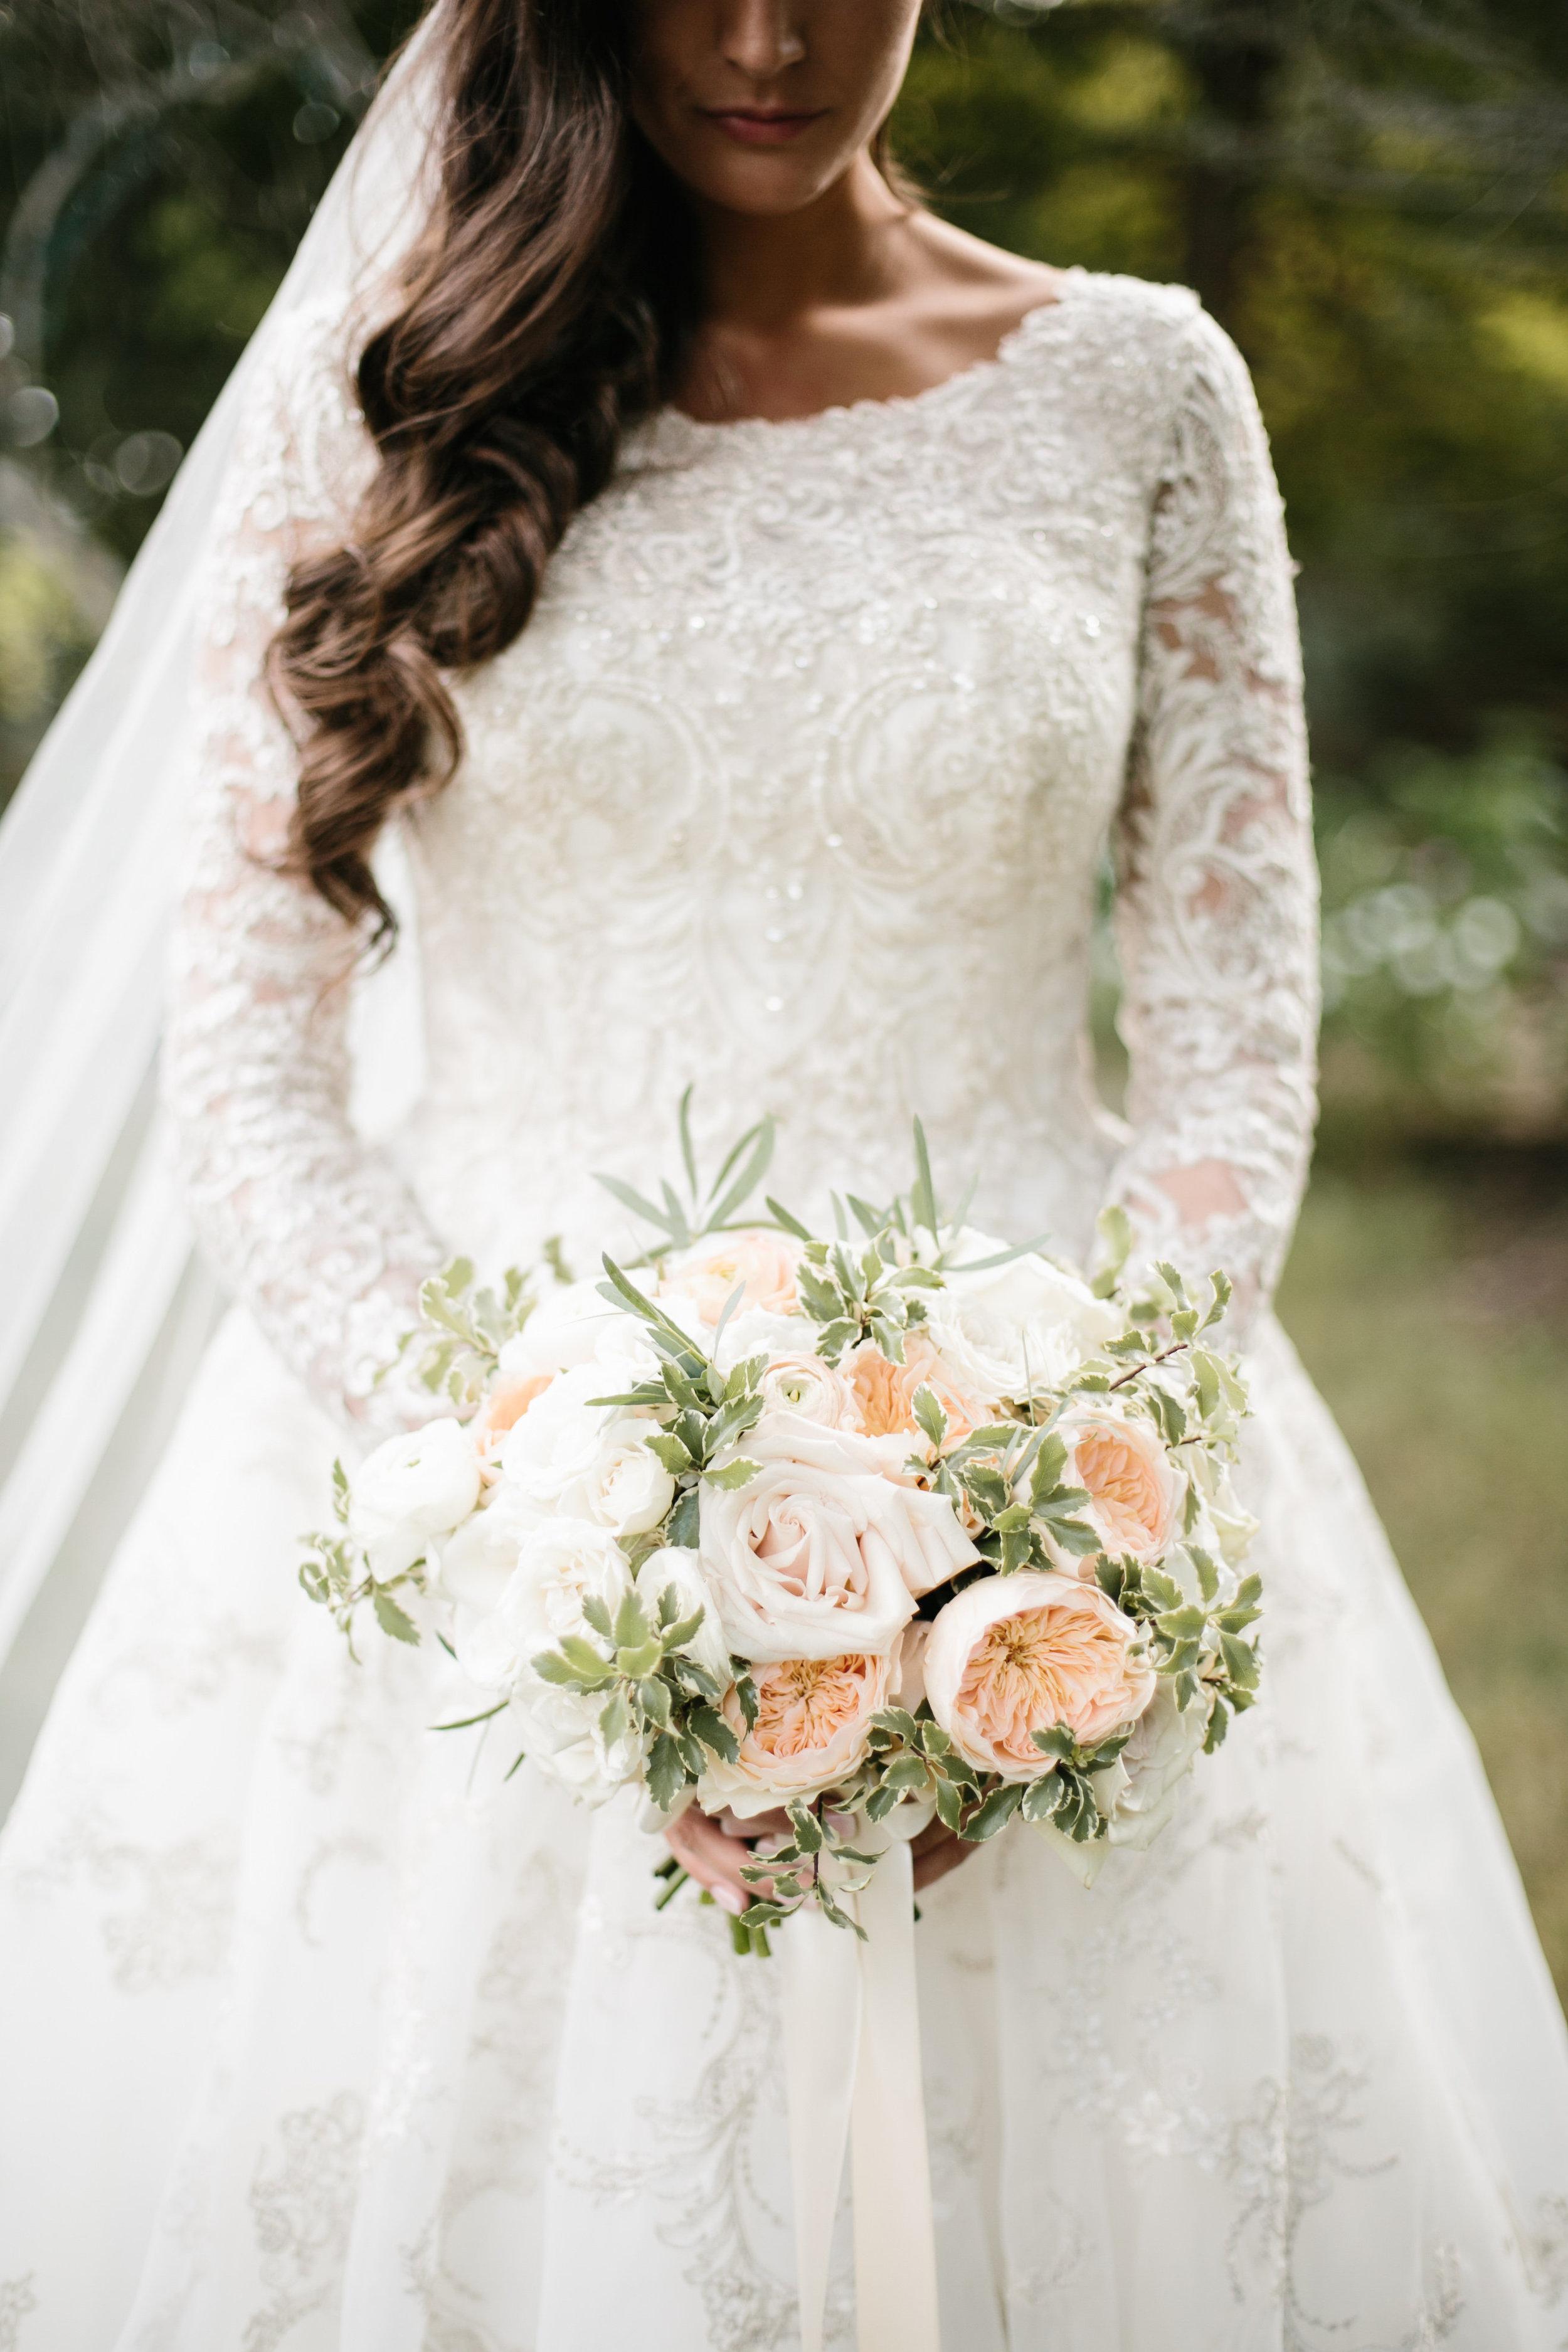 shannon_rose_rent_my_dust_fall_wedding_ (4).jpg